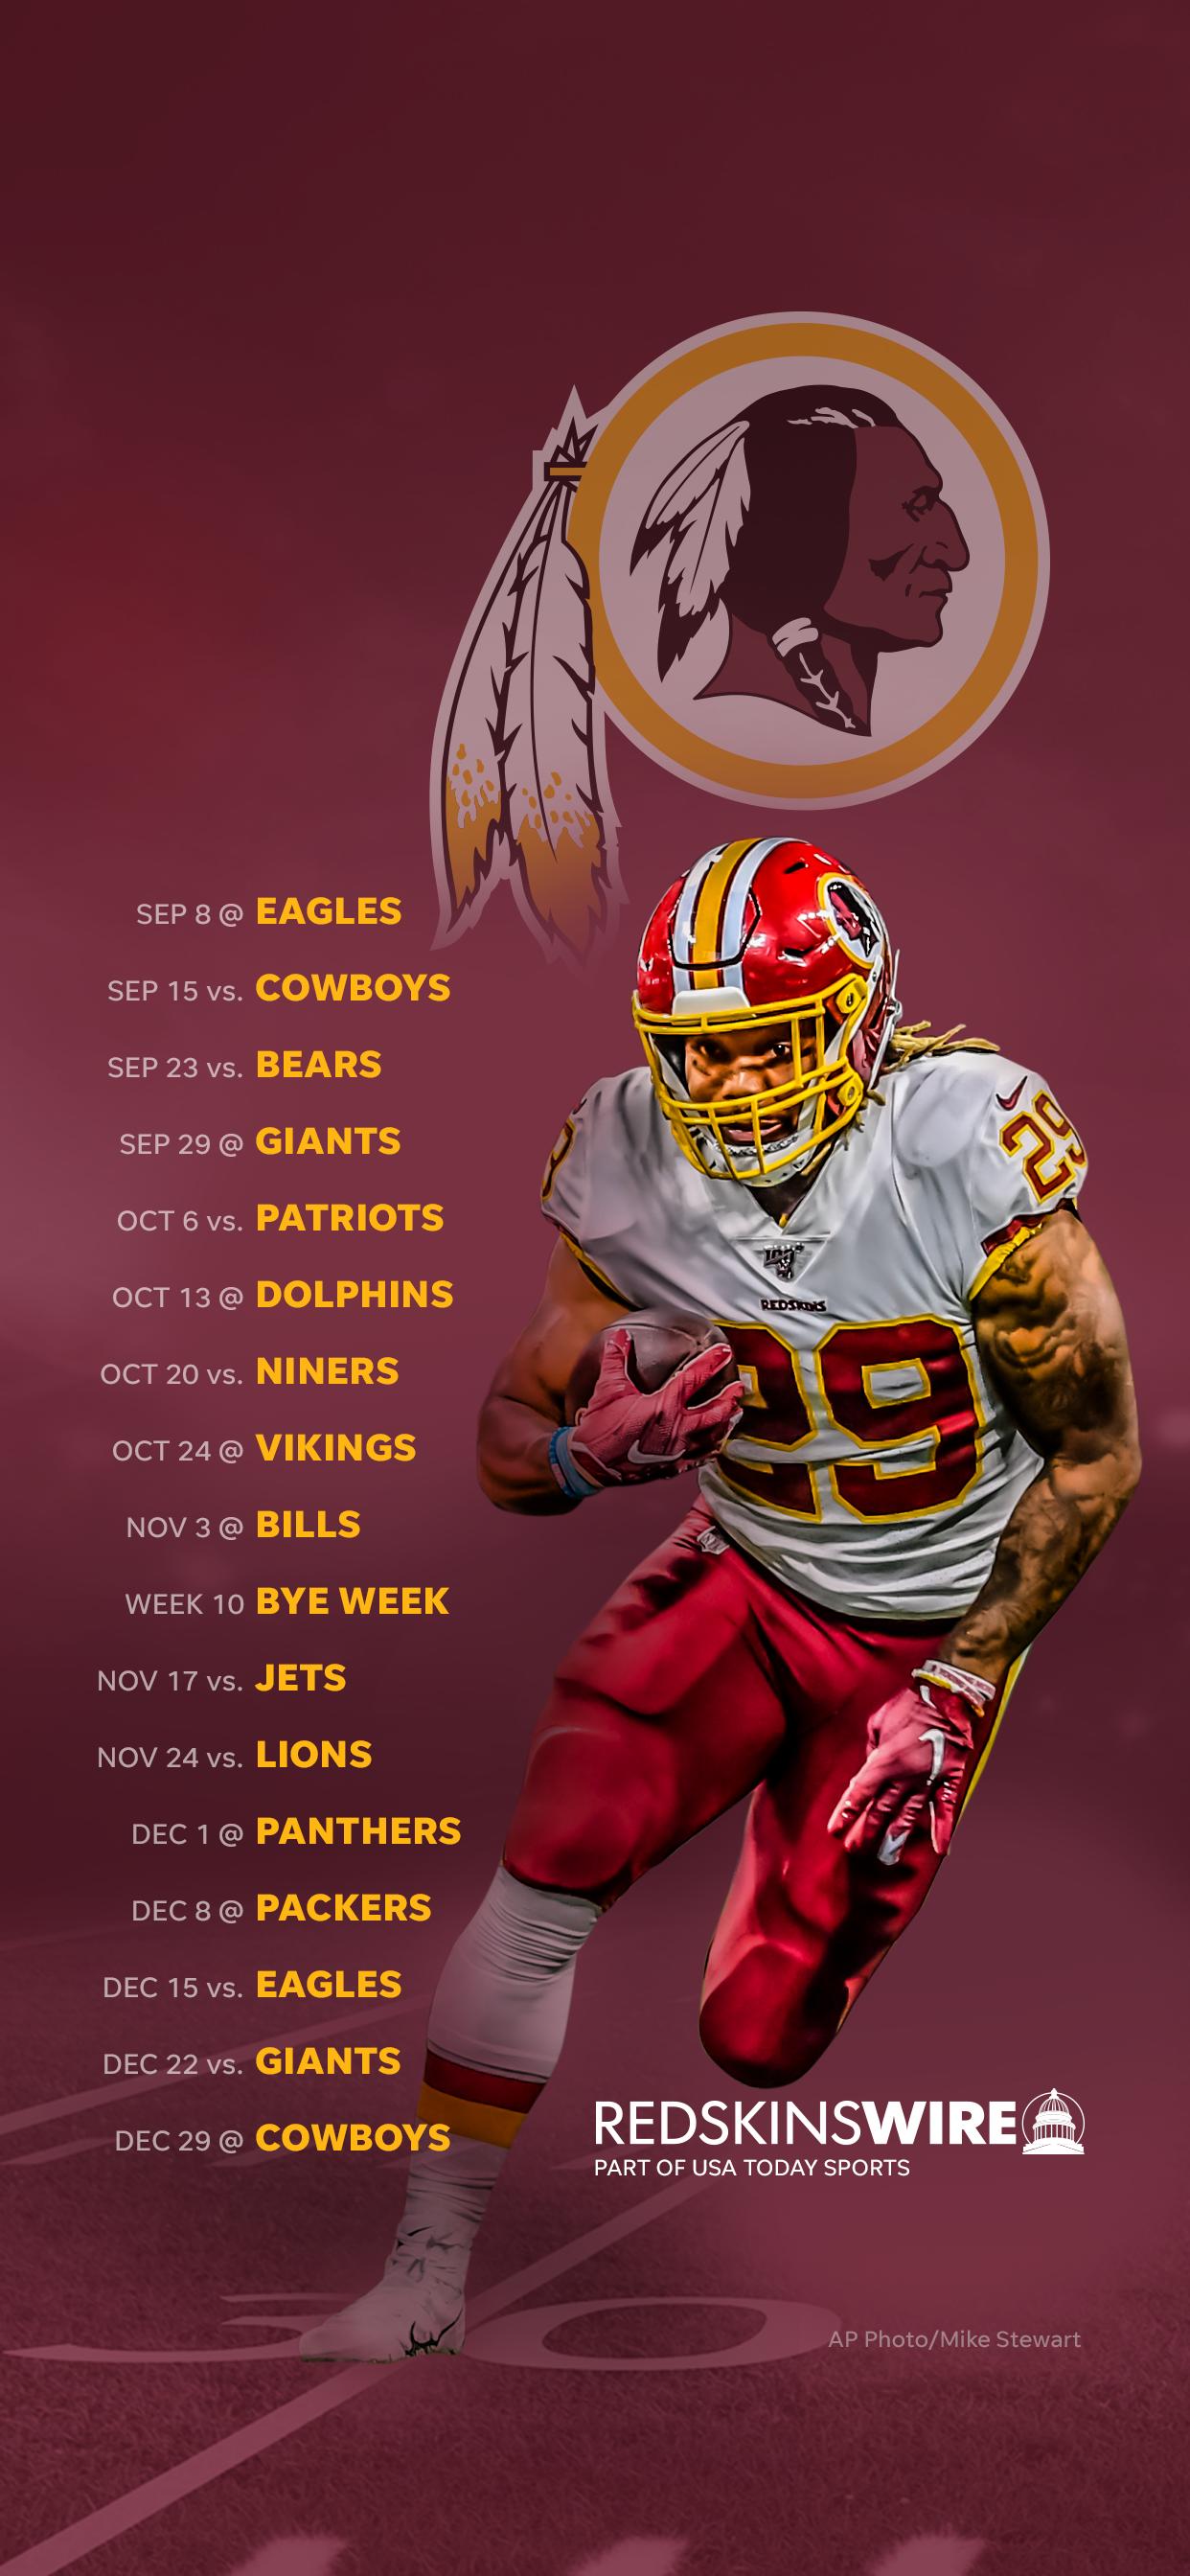 2019 Washington Redskins Schedule Downloadable Wallpaper 1242x2688